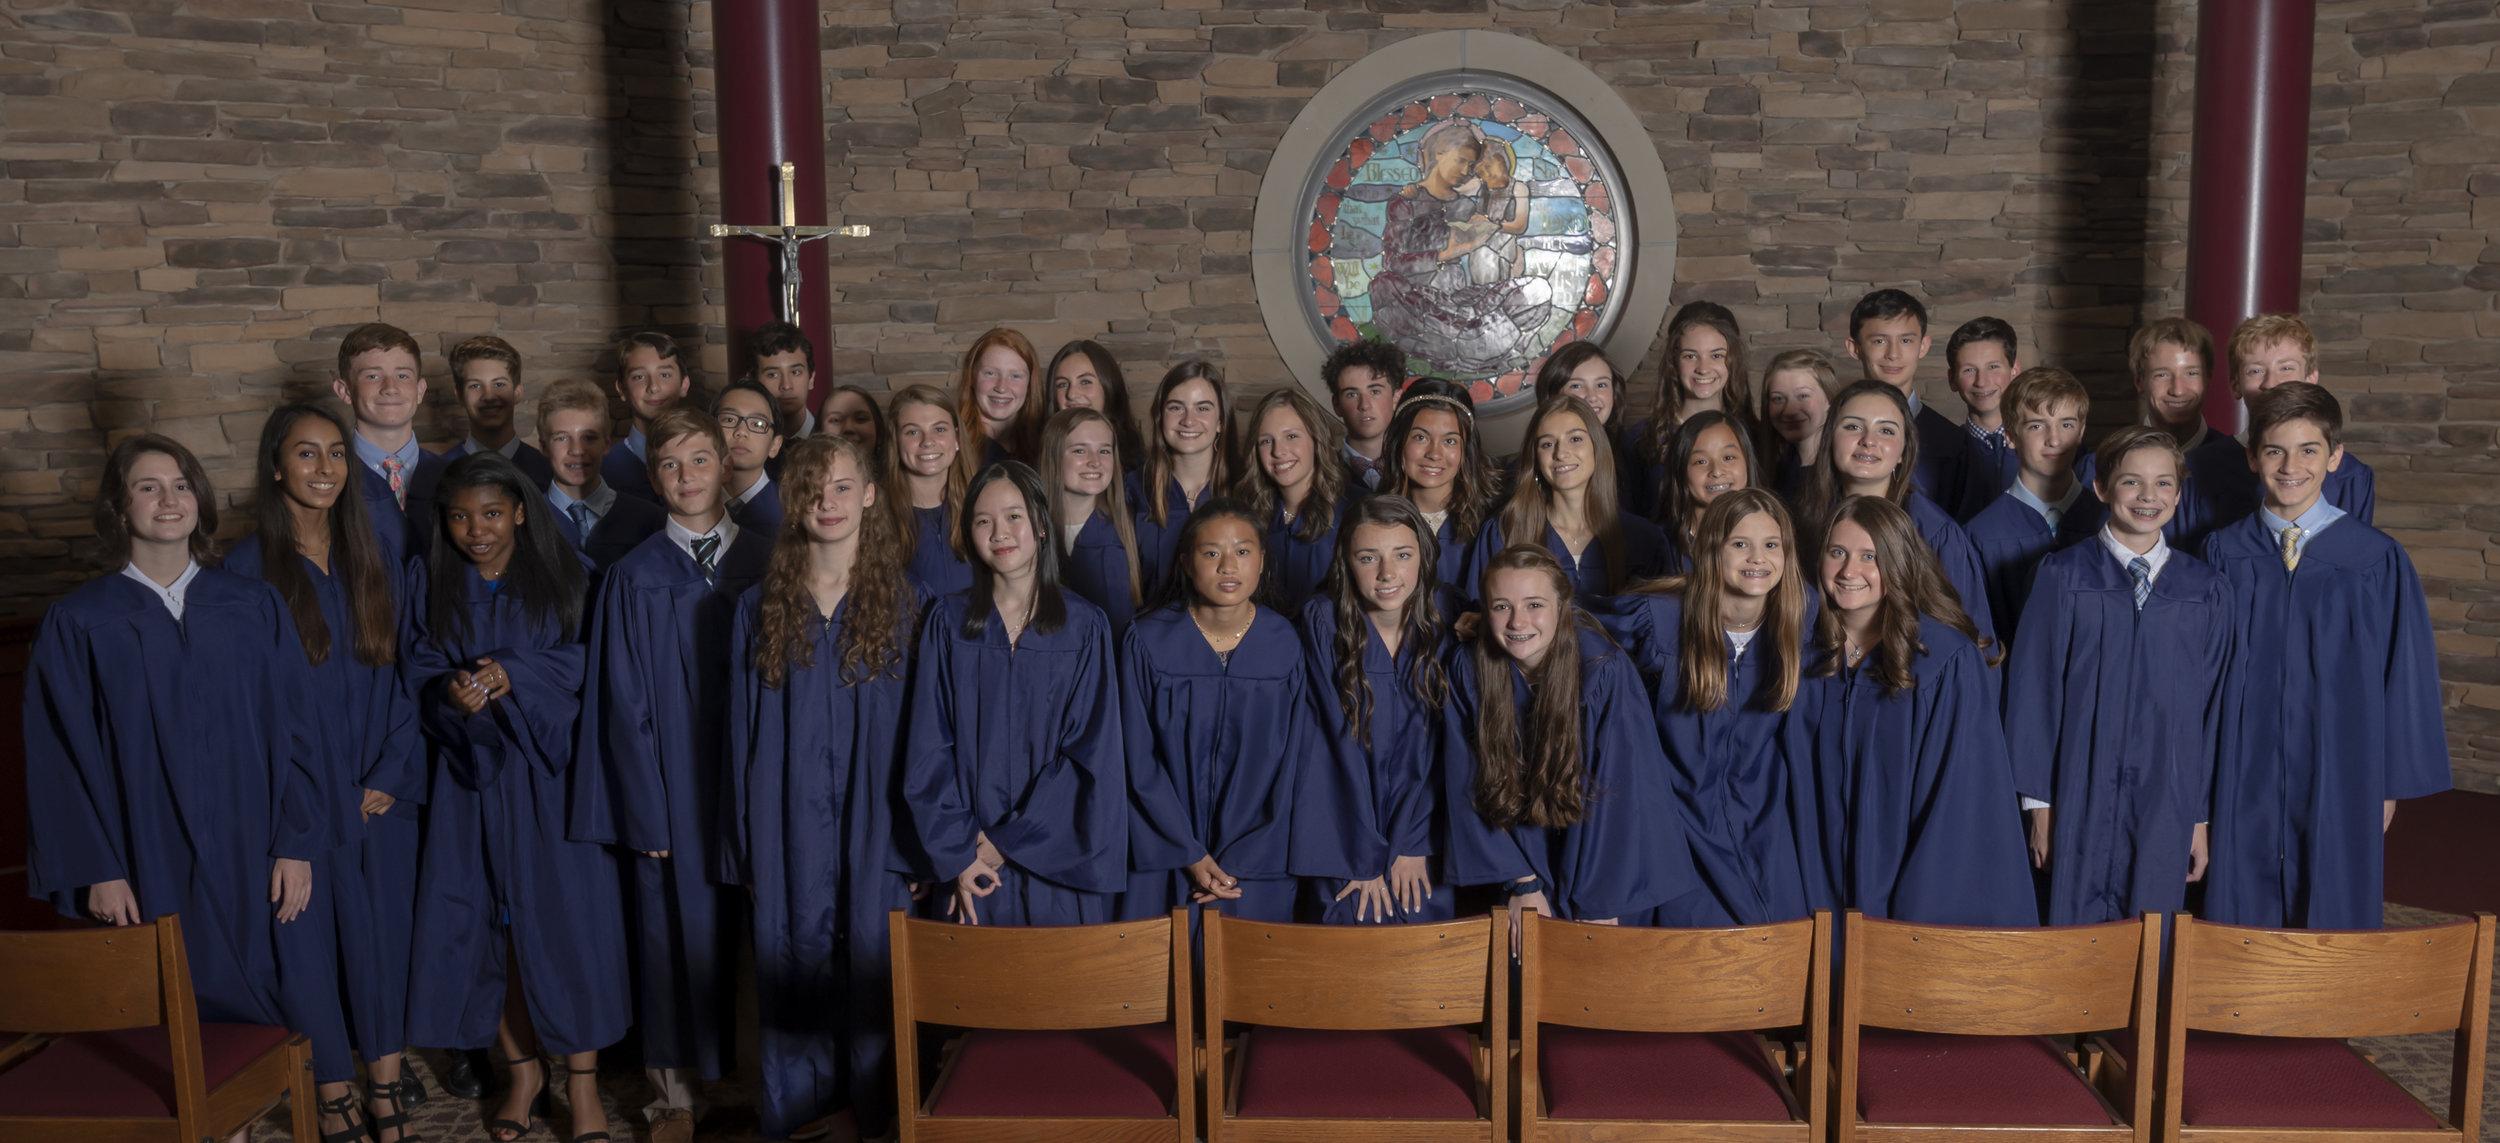 The Class of 2019. Photo courtesy of Parishioner Jerry Wojcik of Jerome Photography.